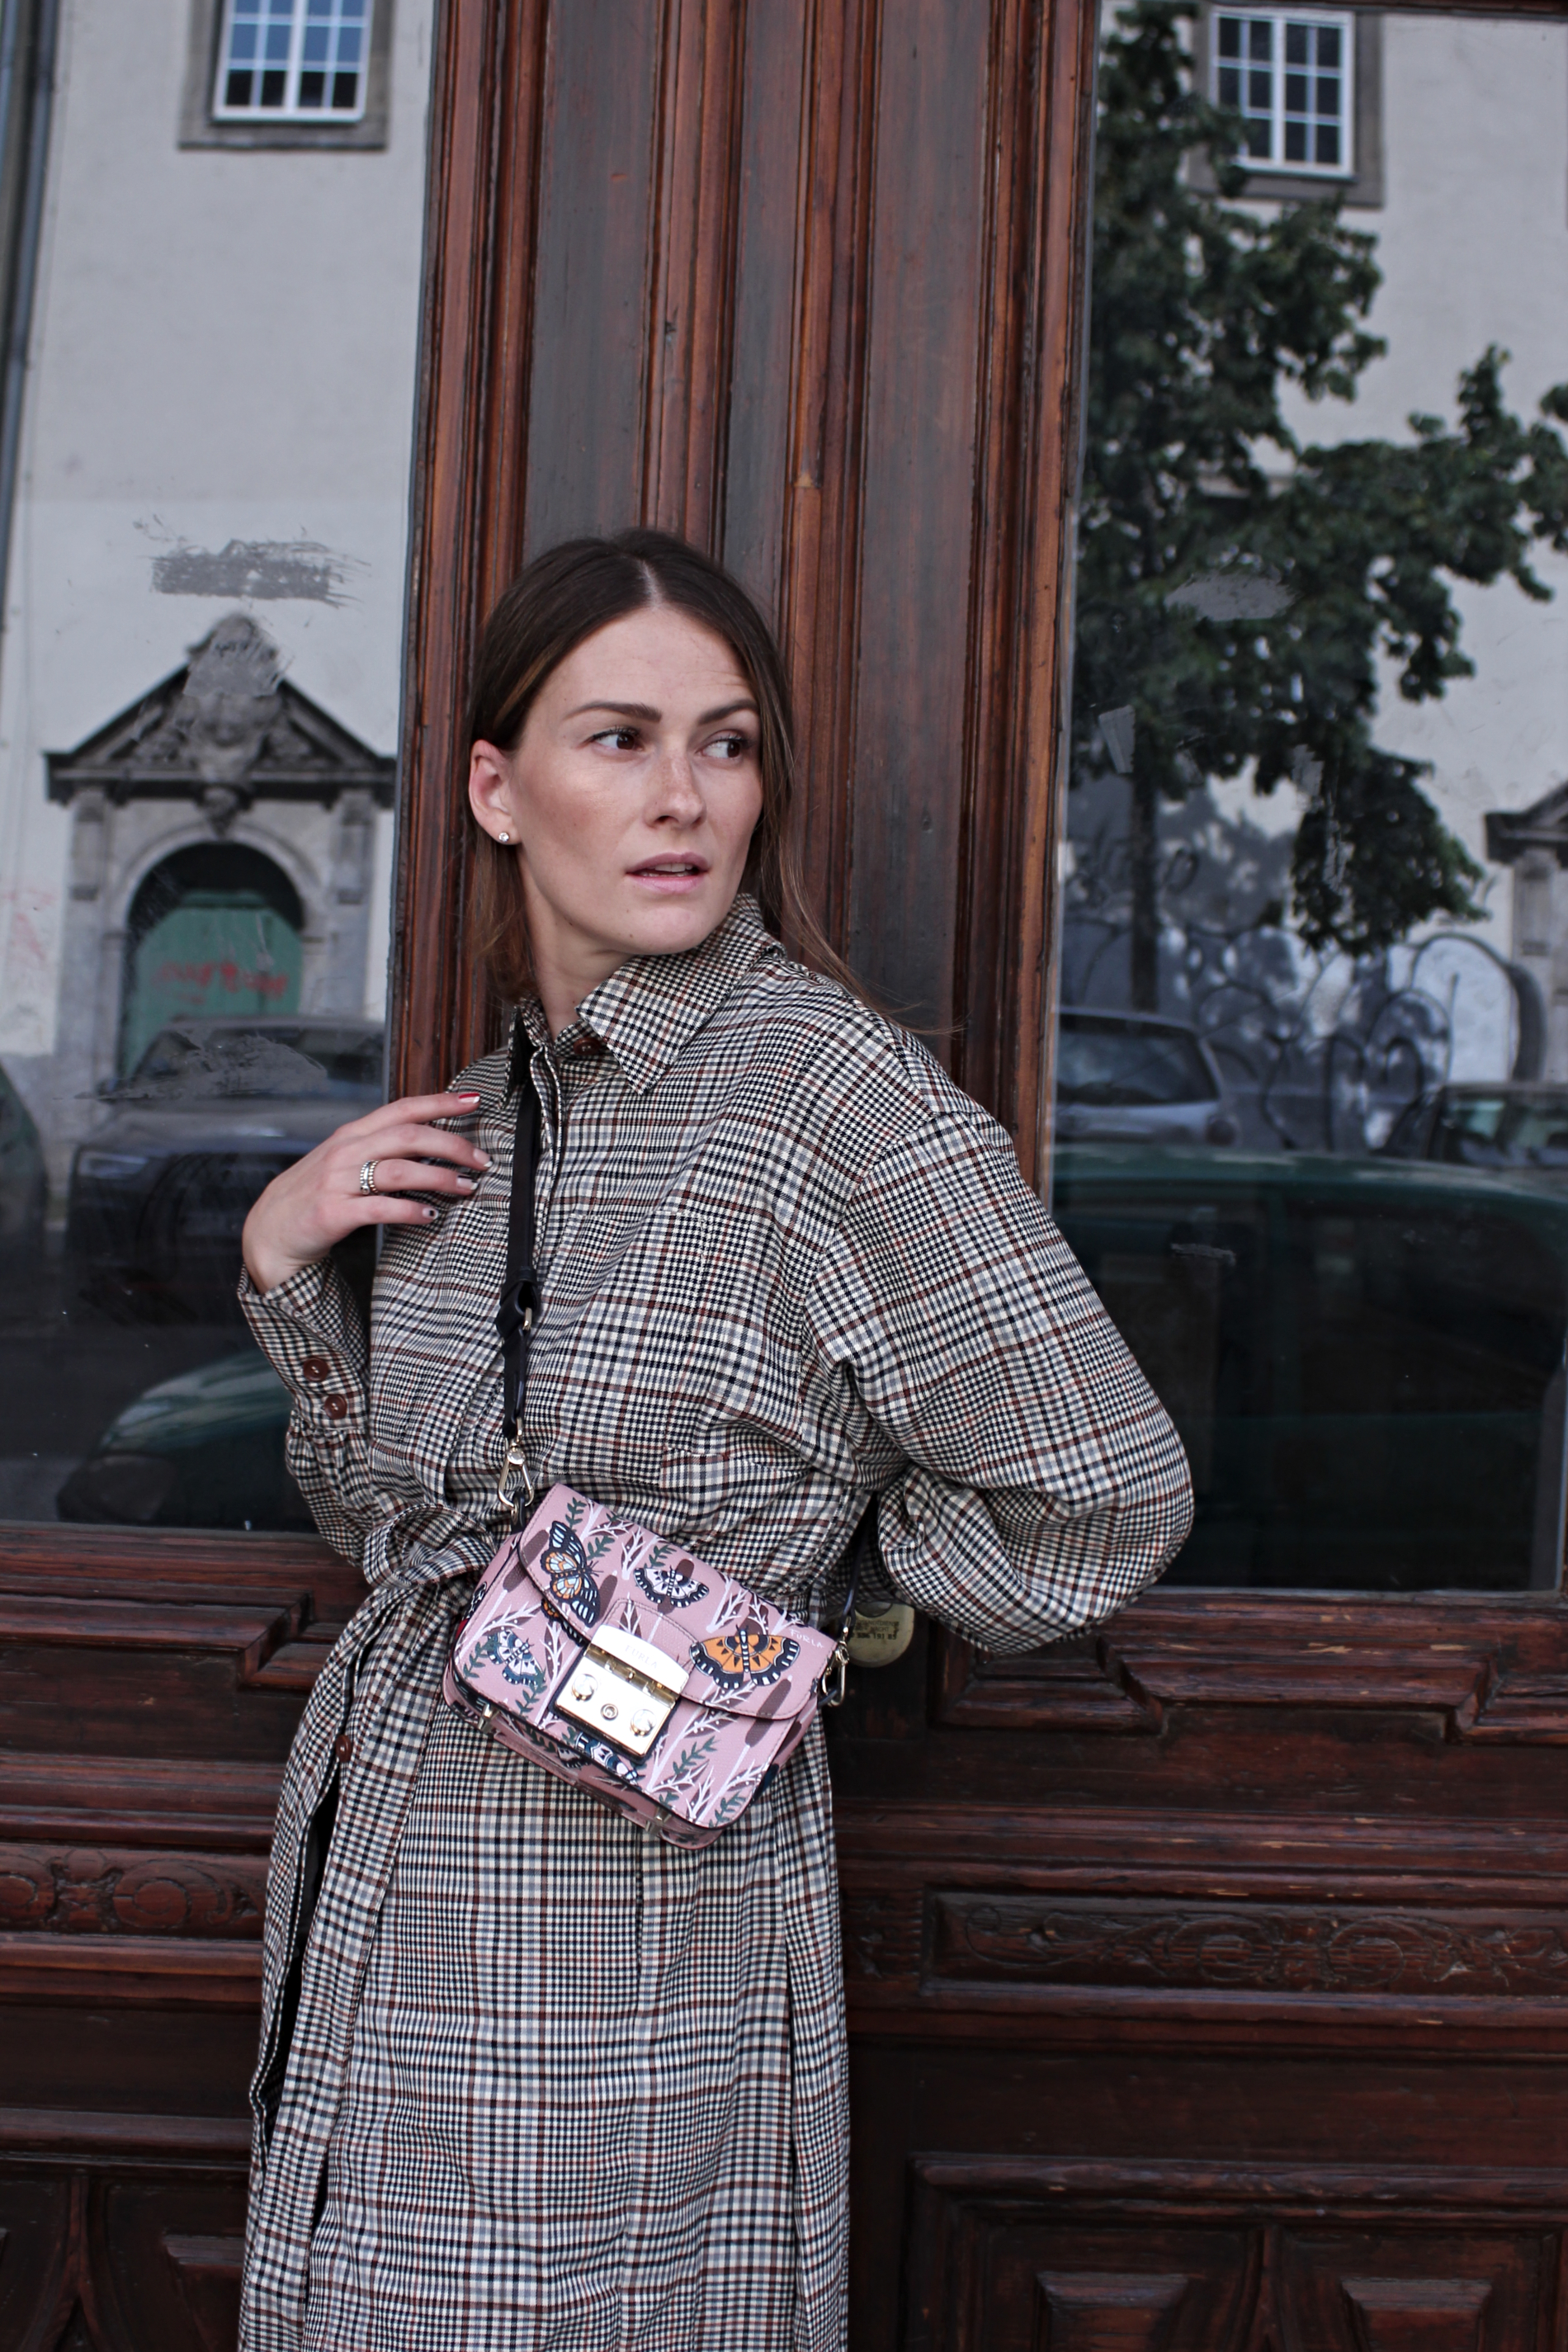 annaporter-checked-coat-hm-fashionblogger-portrait-1.jpg